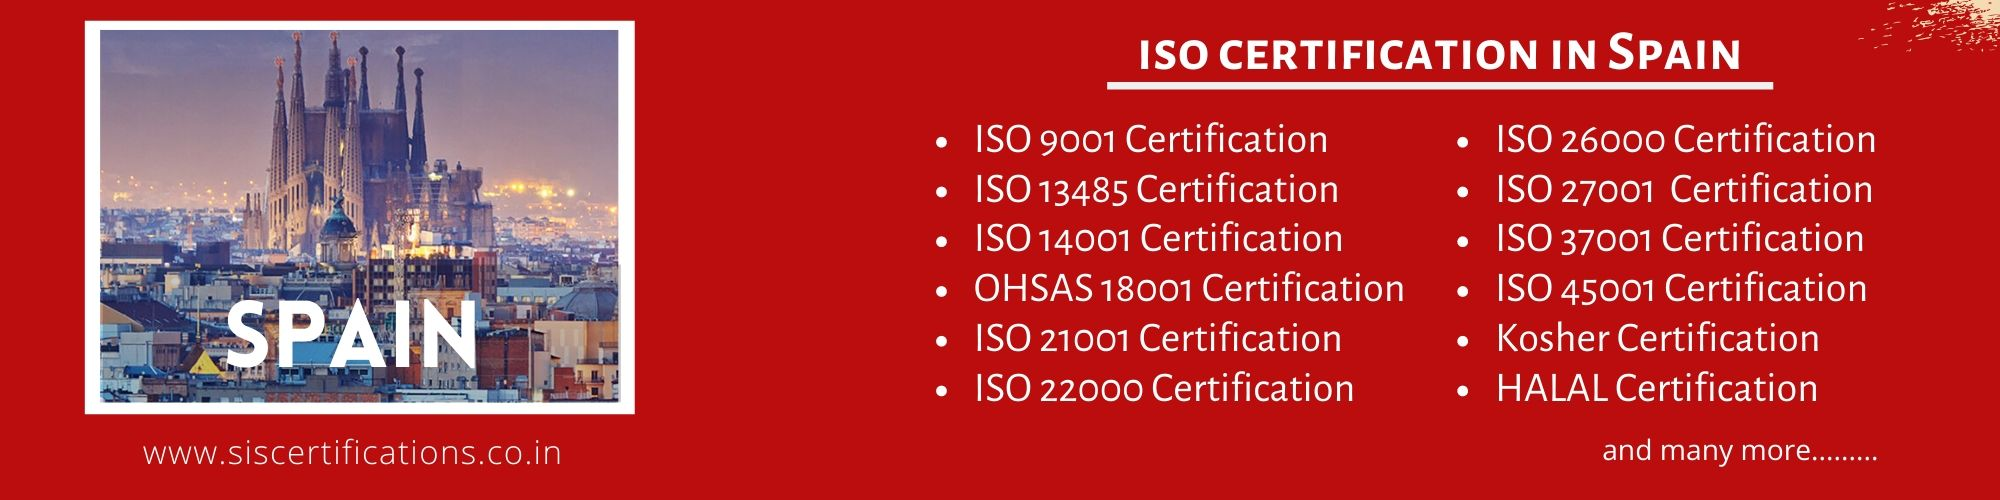 iso certification in Croatia;